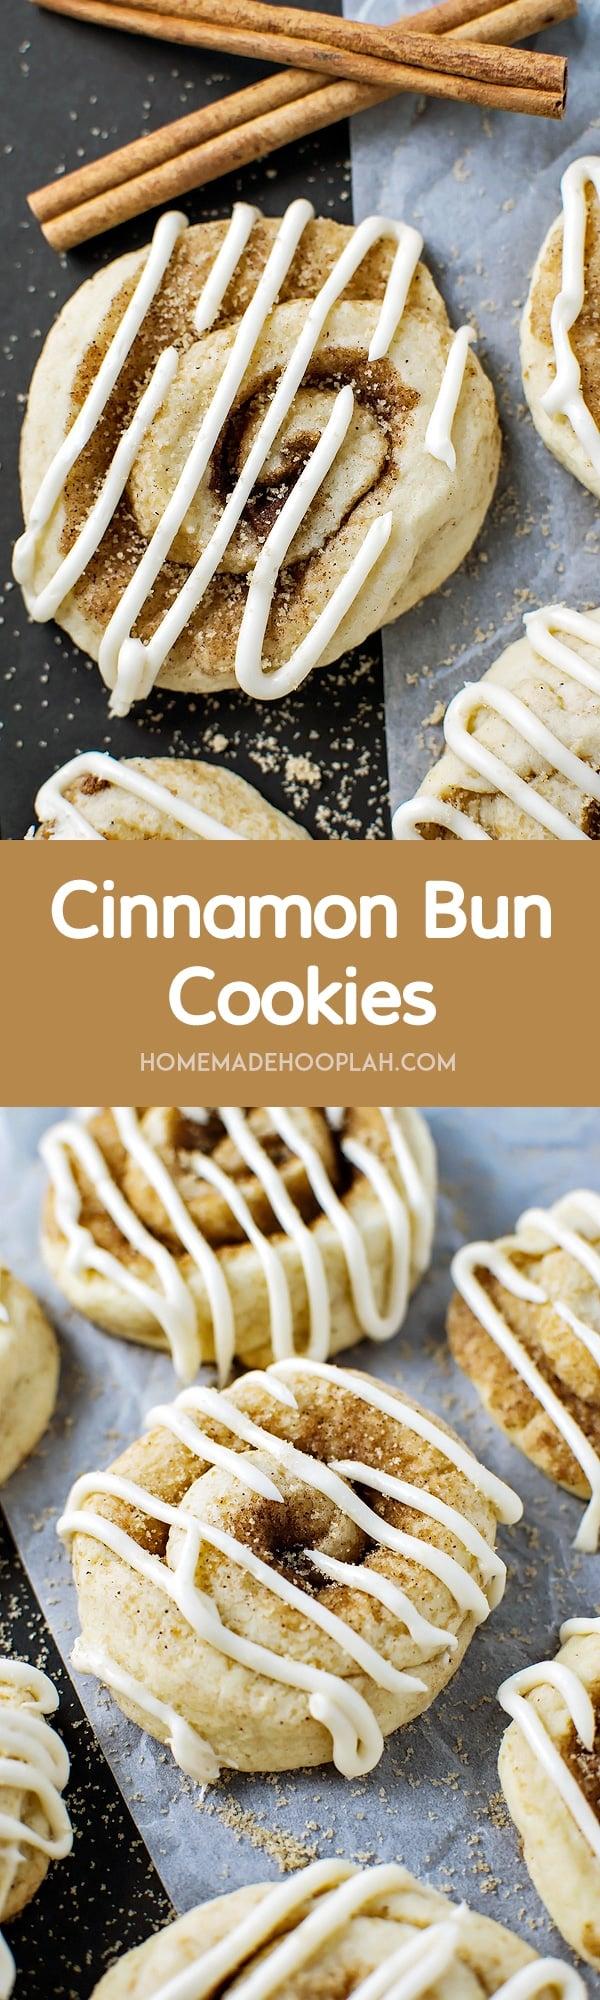 Cinnamon Bun Cookies! The sweet taste of cinnamon buns wrapped up in sugary cinnamon cookies. All the flavor for half the fuss! | HomemadeHooplah.com